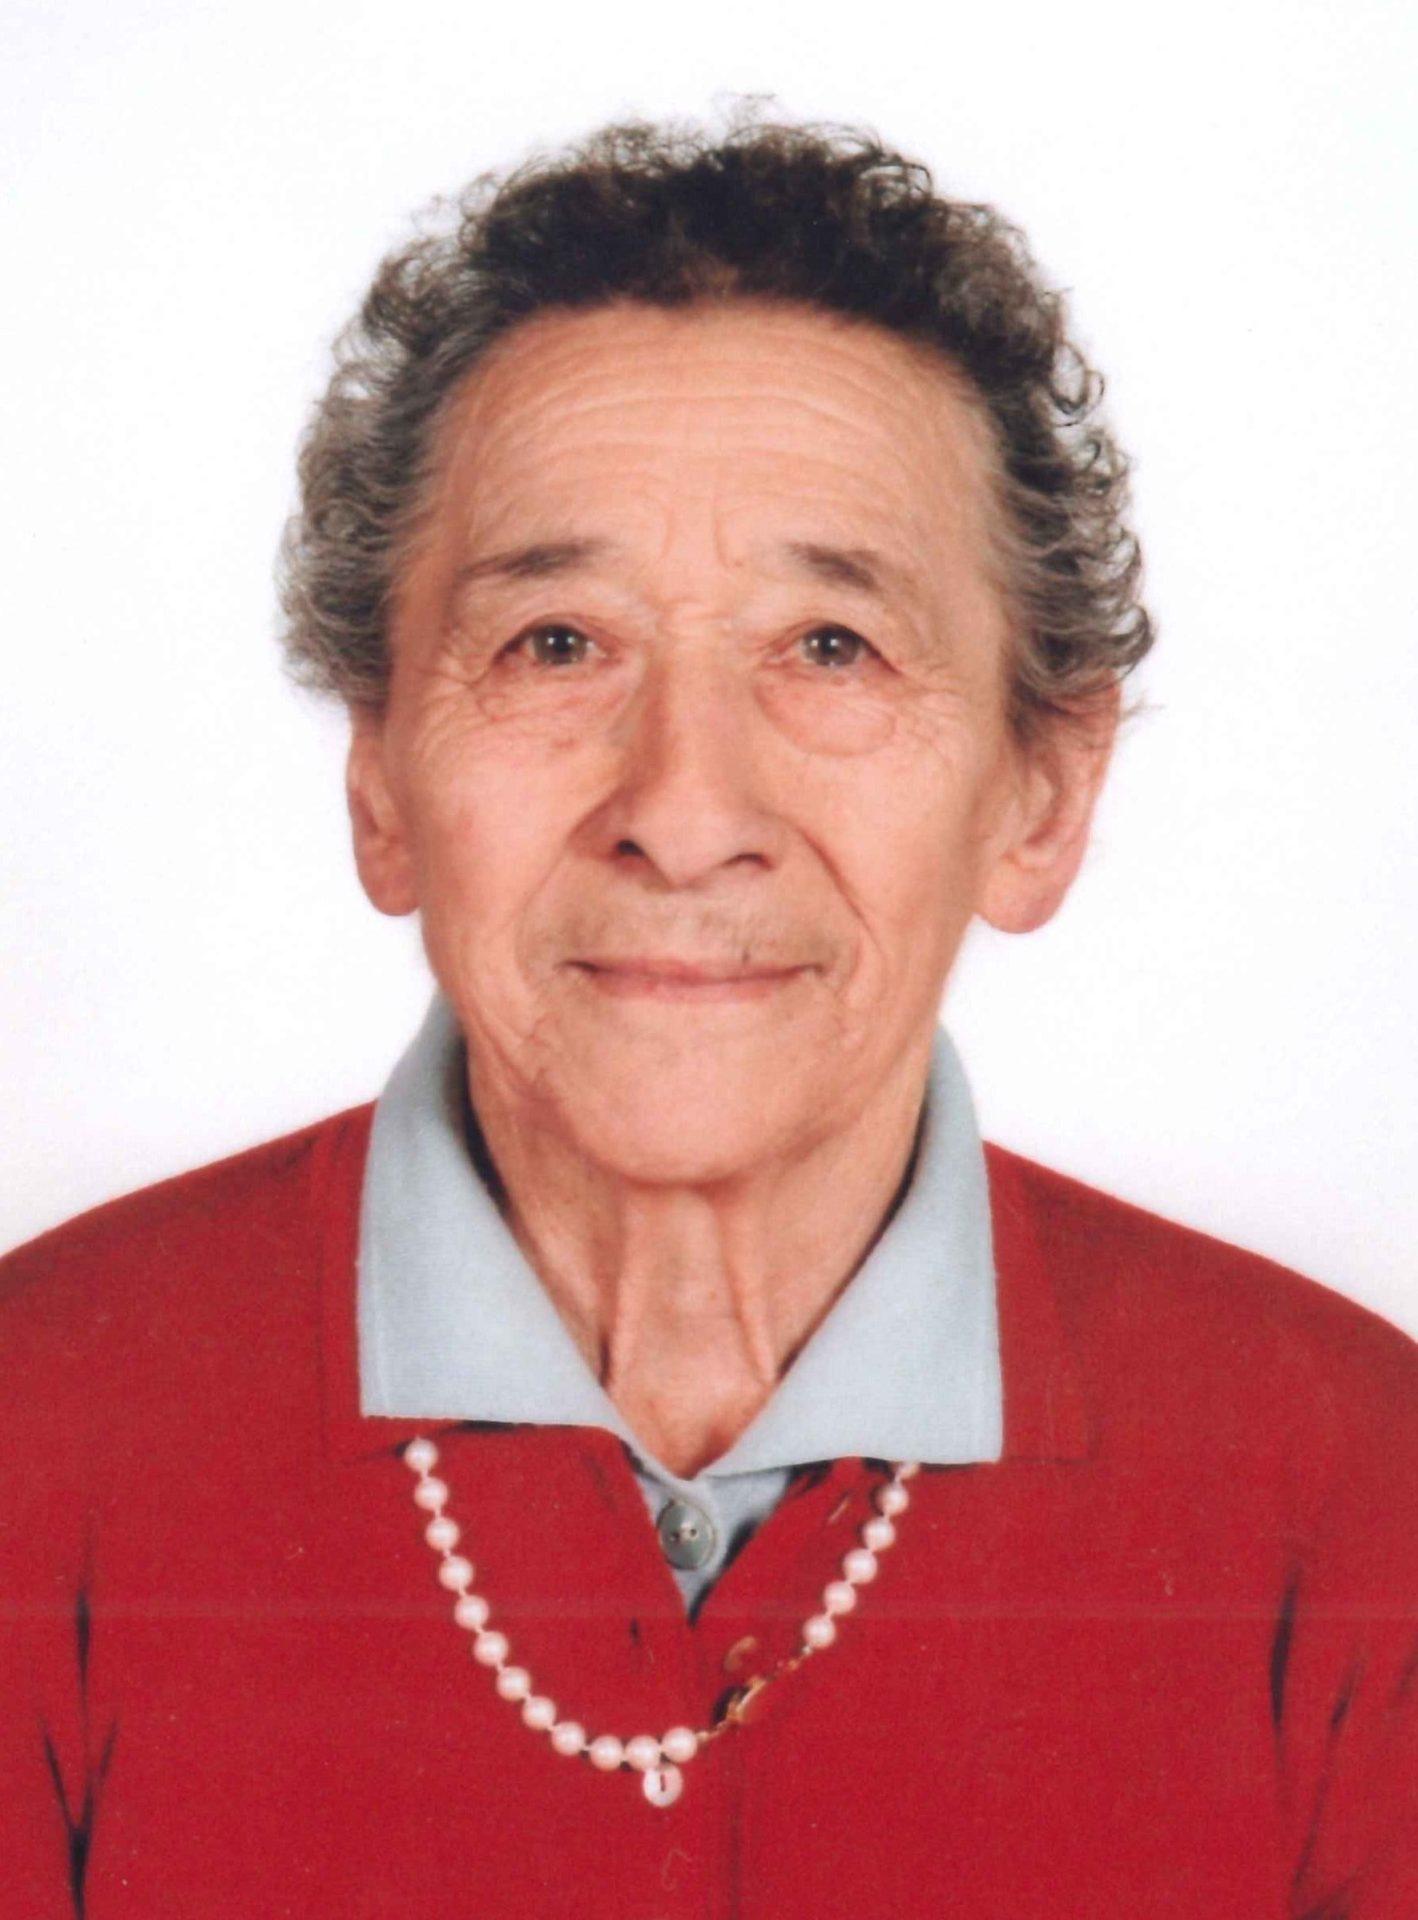 Maria Scodellaro ved. Castellani